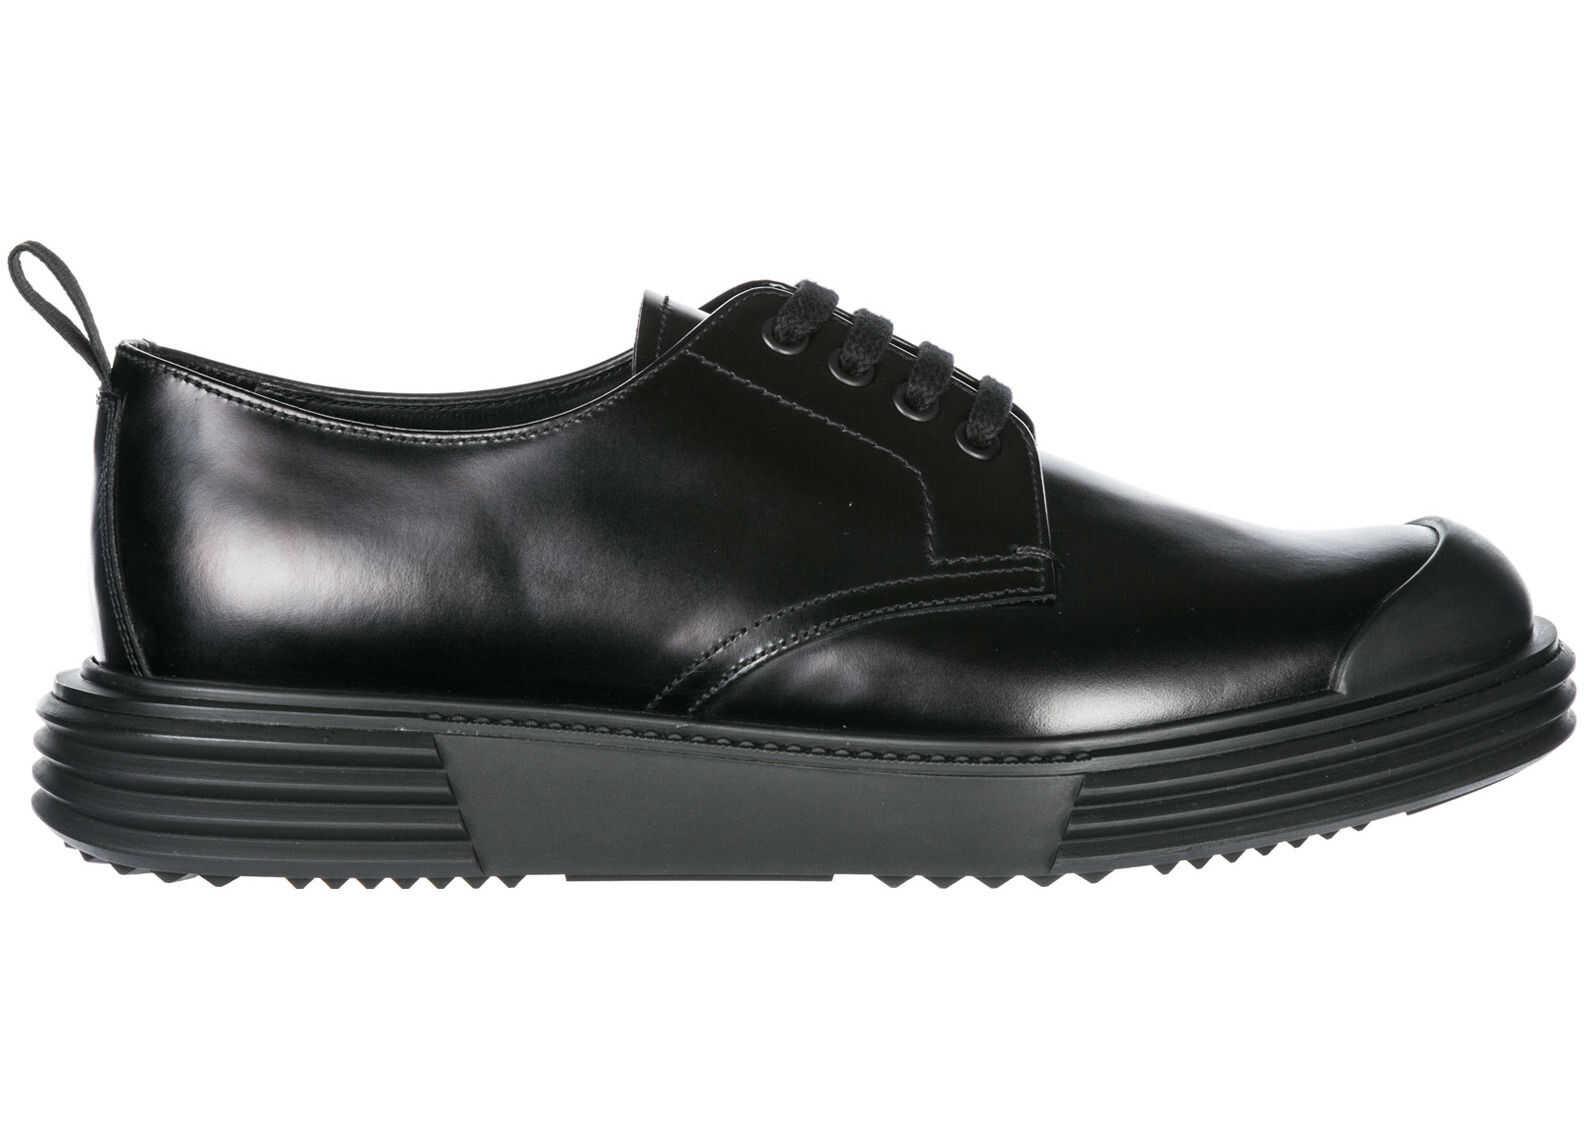 Prada Shoes Derby Black